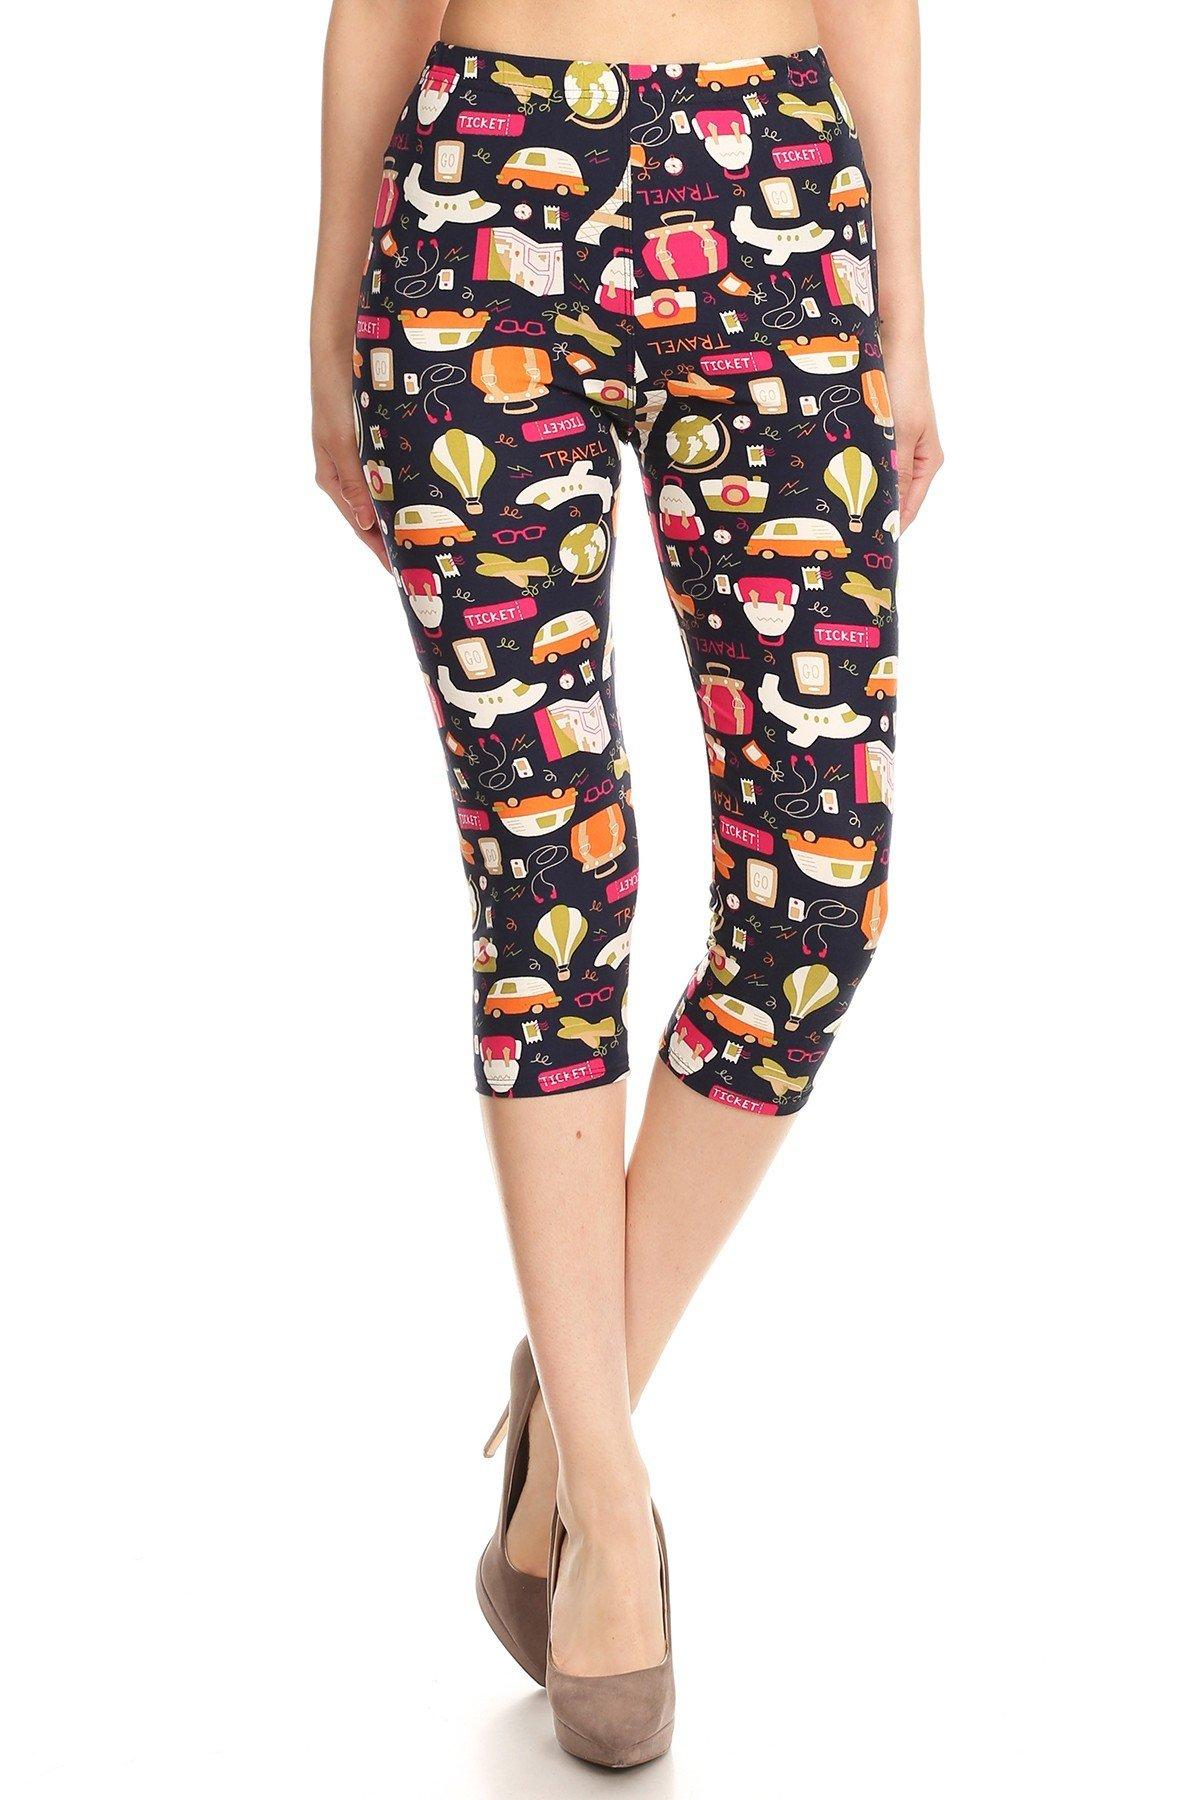 iZZYZX Women's Plus Colorful Travel Ticket Theme Printed Cropped Capri Leggings